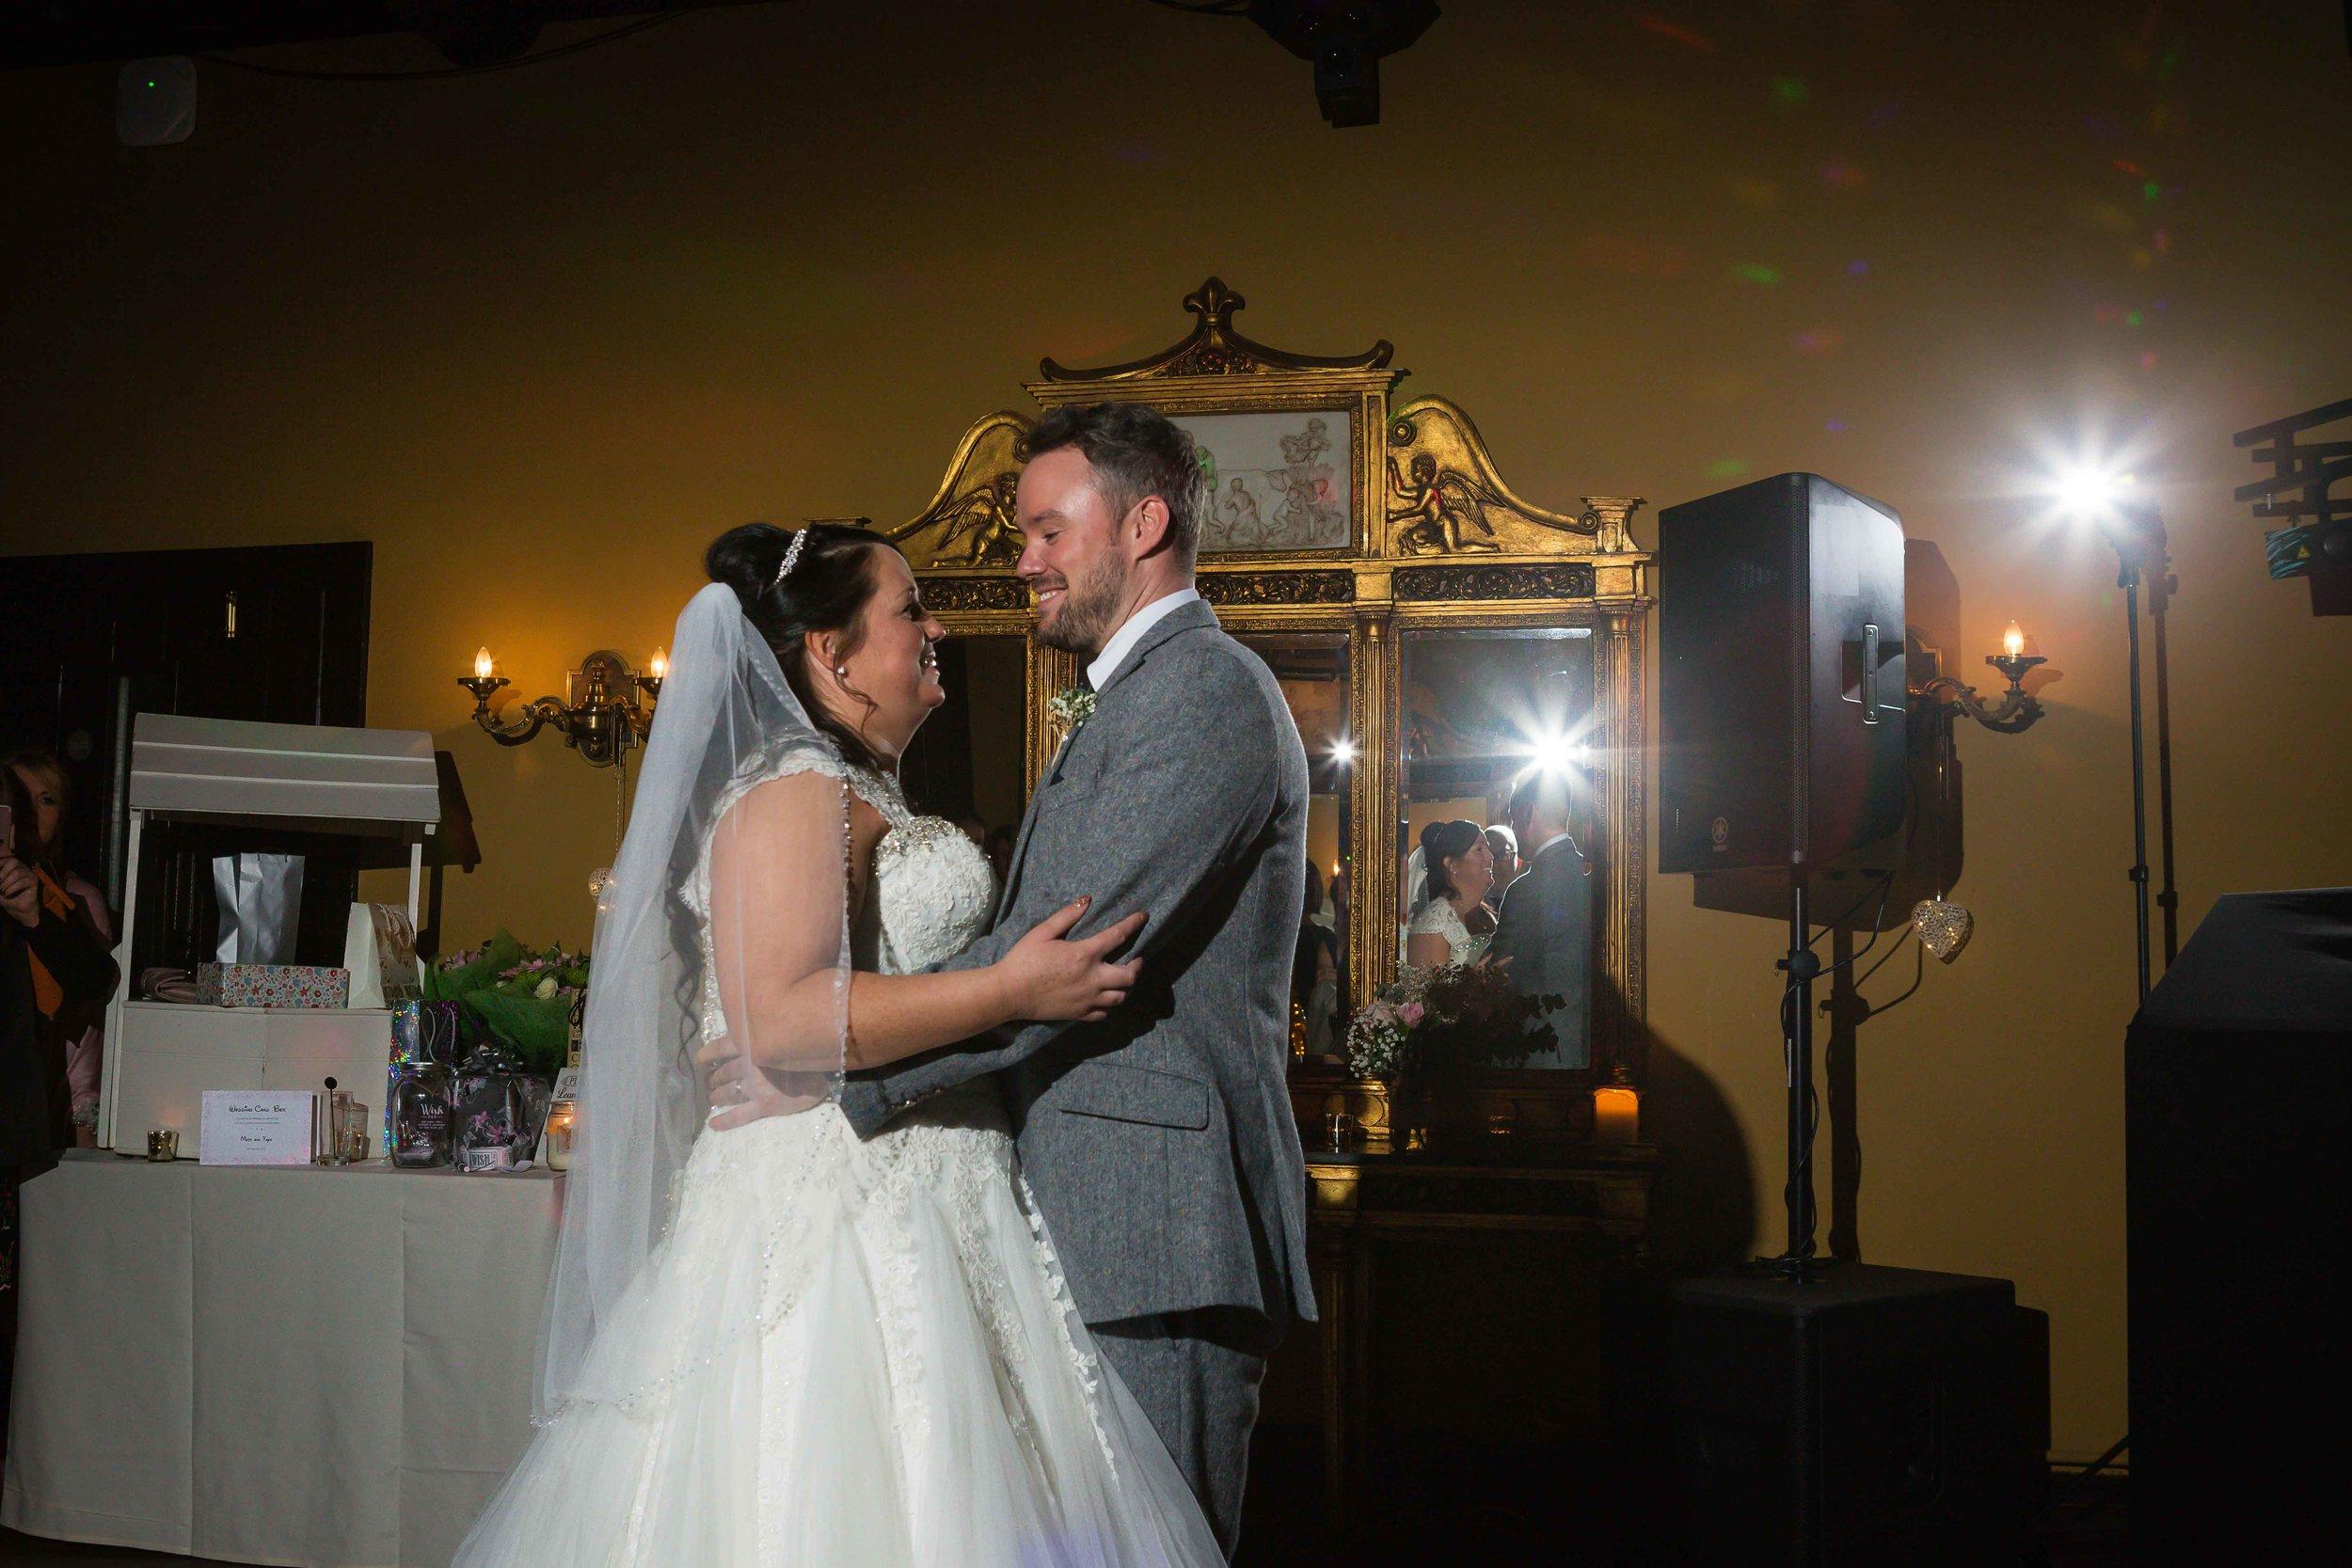 14.02.17 - Matt-Faye-Coombe-Abbey-Valentine-Wedding-Charnwood-Photography-1092.jpg